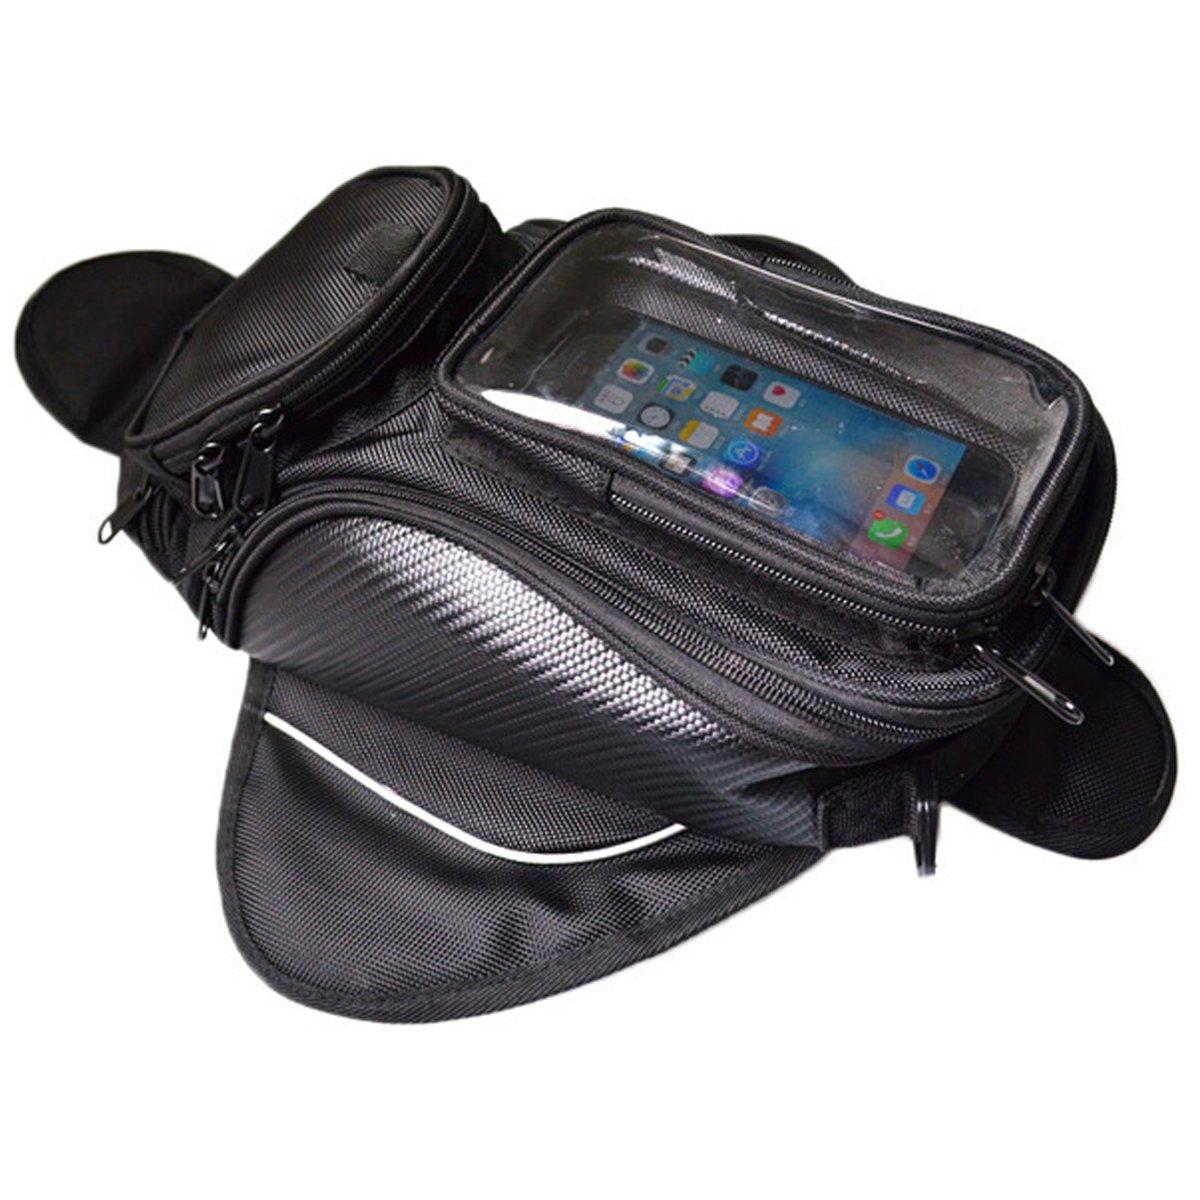 Lozom Motorcycle Gas Oil Fuel Tank Bag Waterproof Backpack & Magnetic Motorcycle Tank Bag for Honda Yamaha Suzuki Kawasaki Harley flower zombies.Ltd